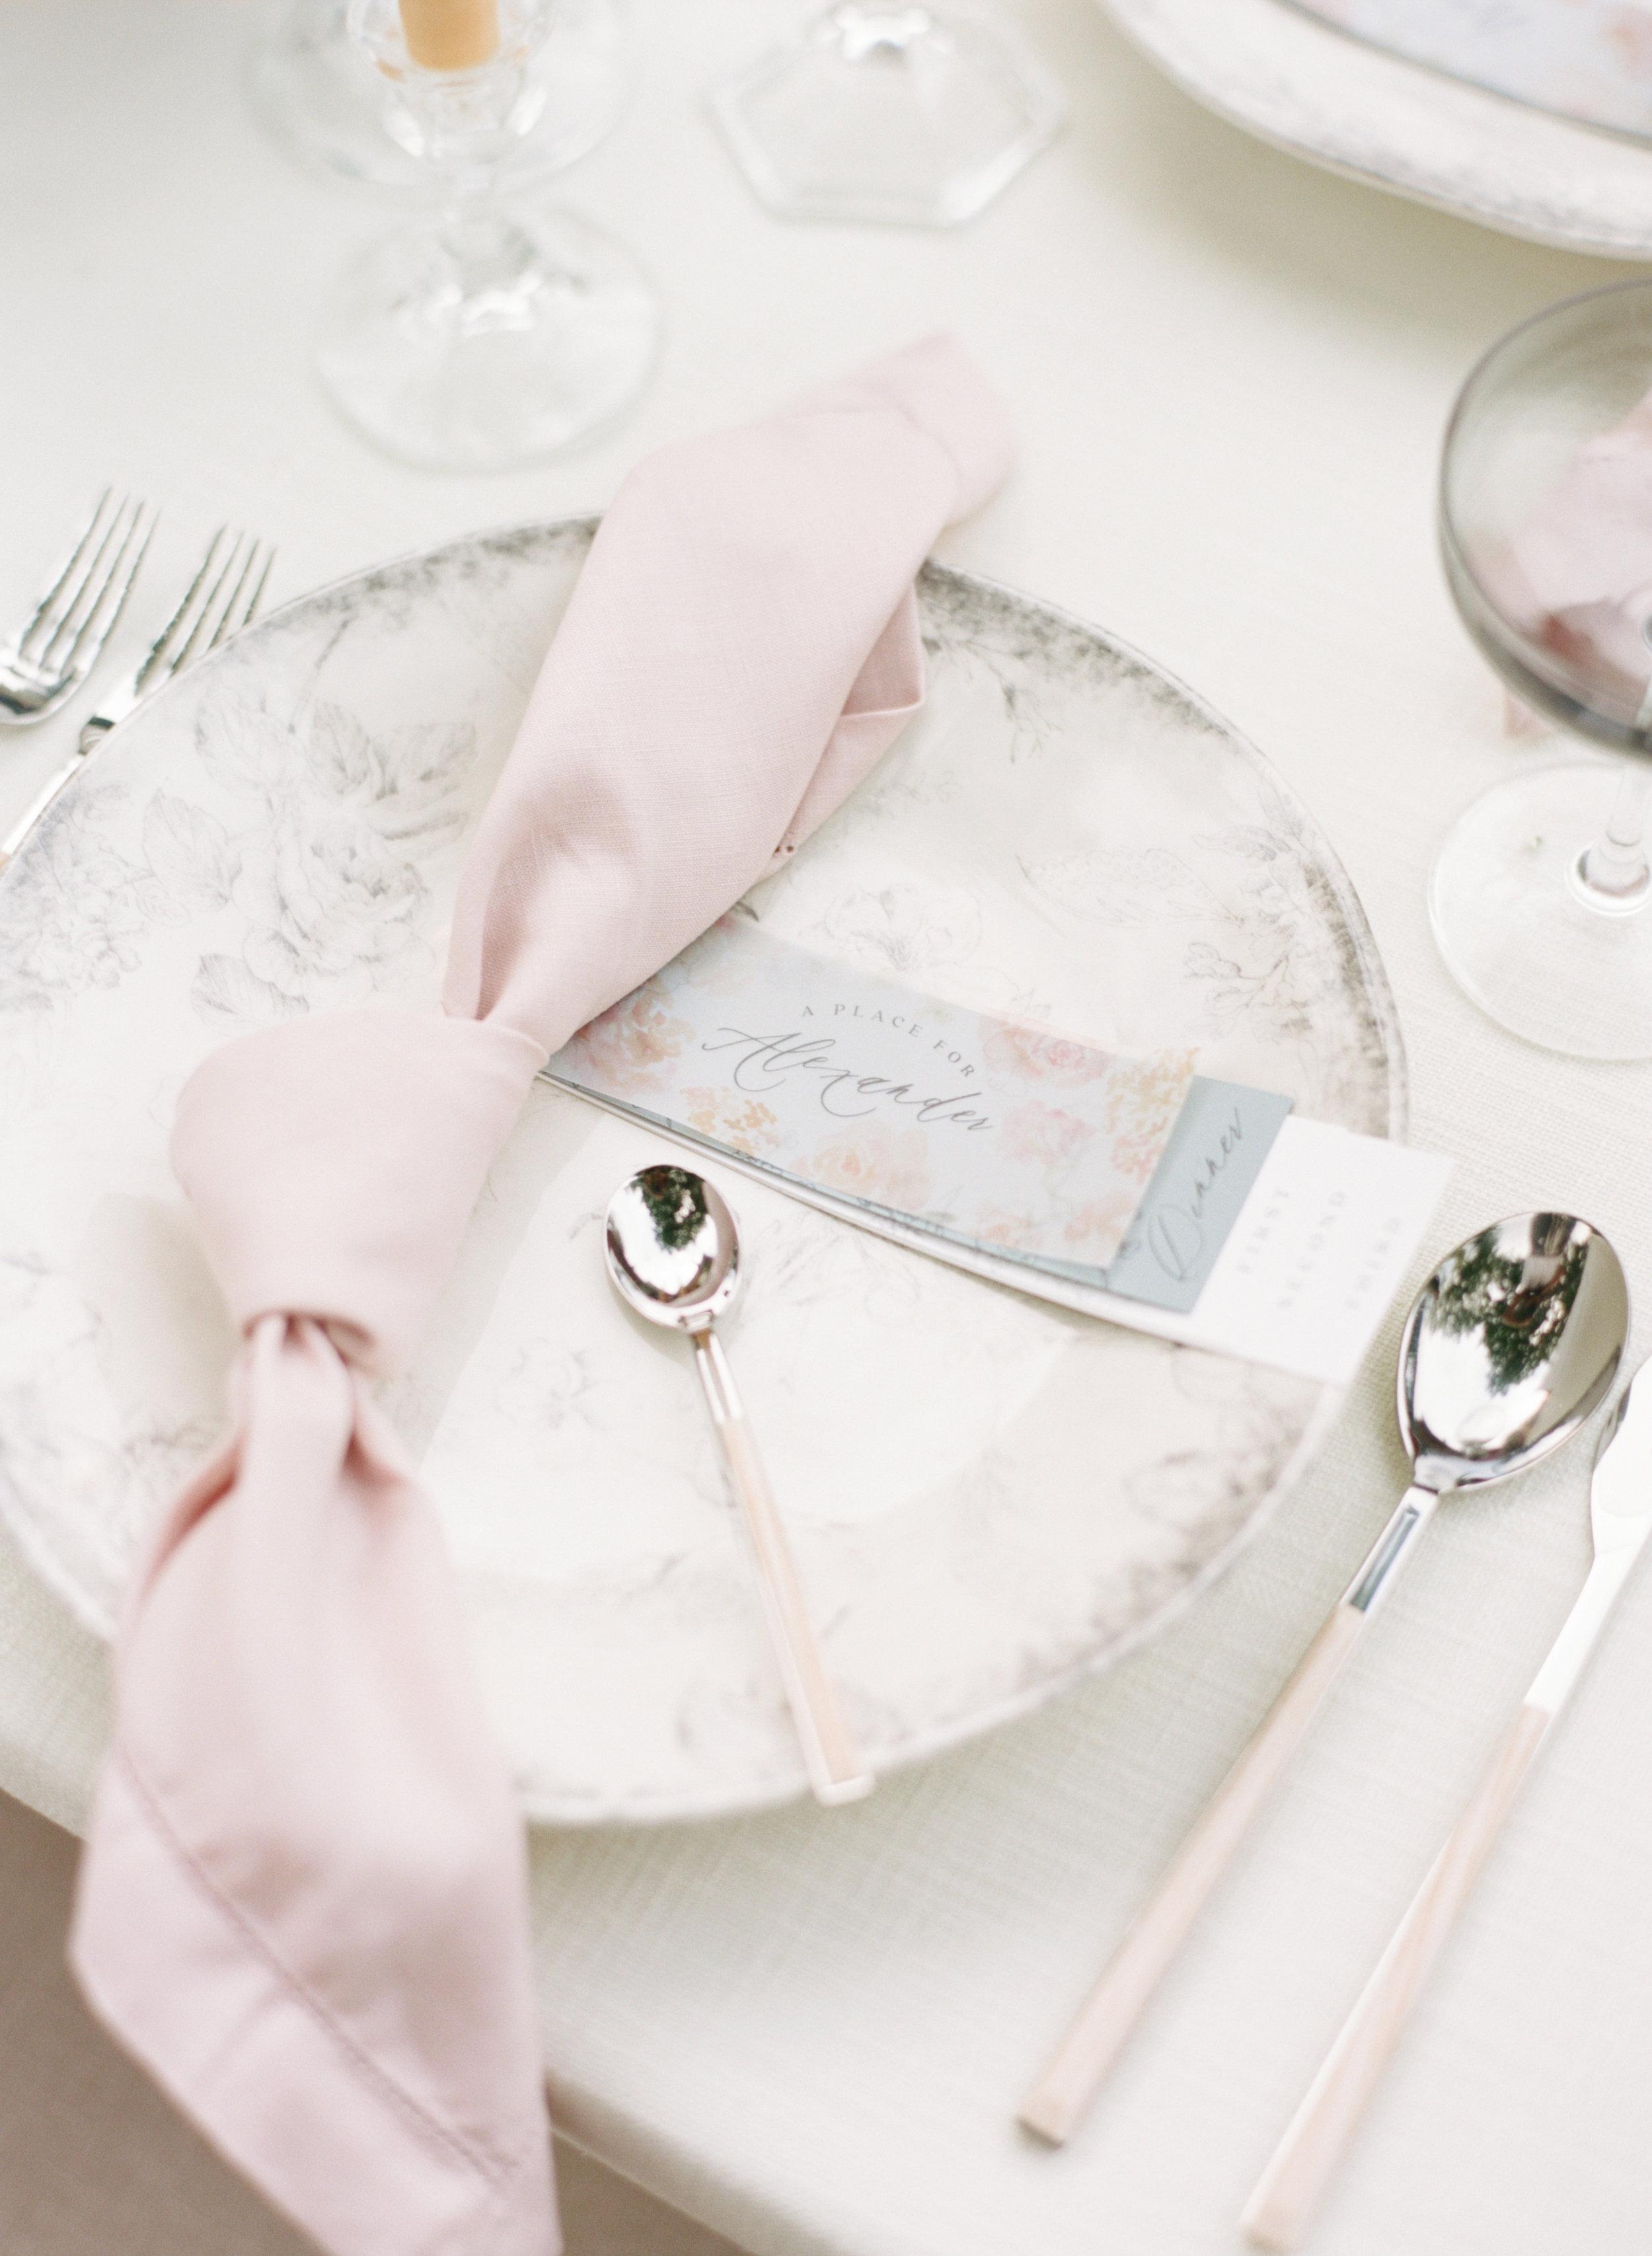 alexandra-meseke-understated-soft-luxury-wedding-upstate-ny_0129.jpg